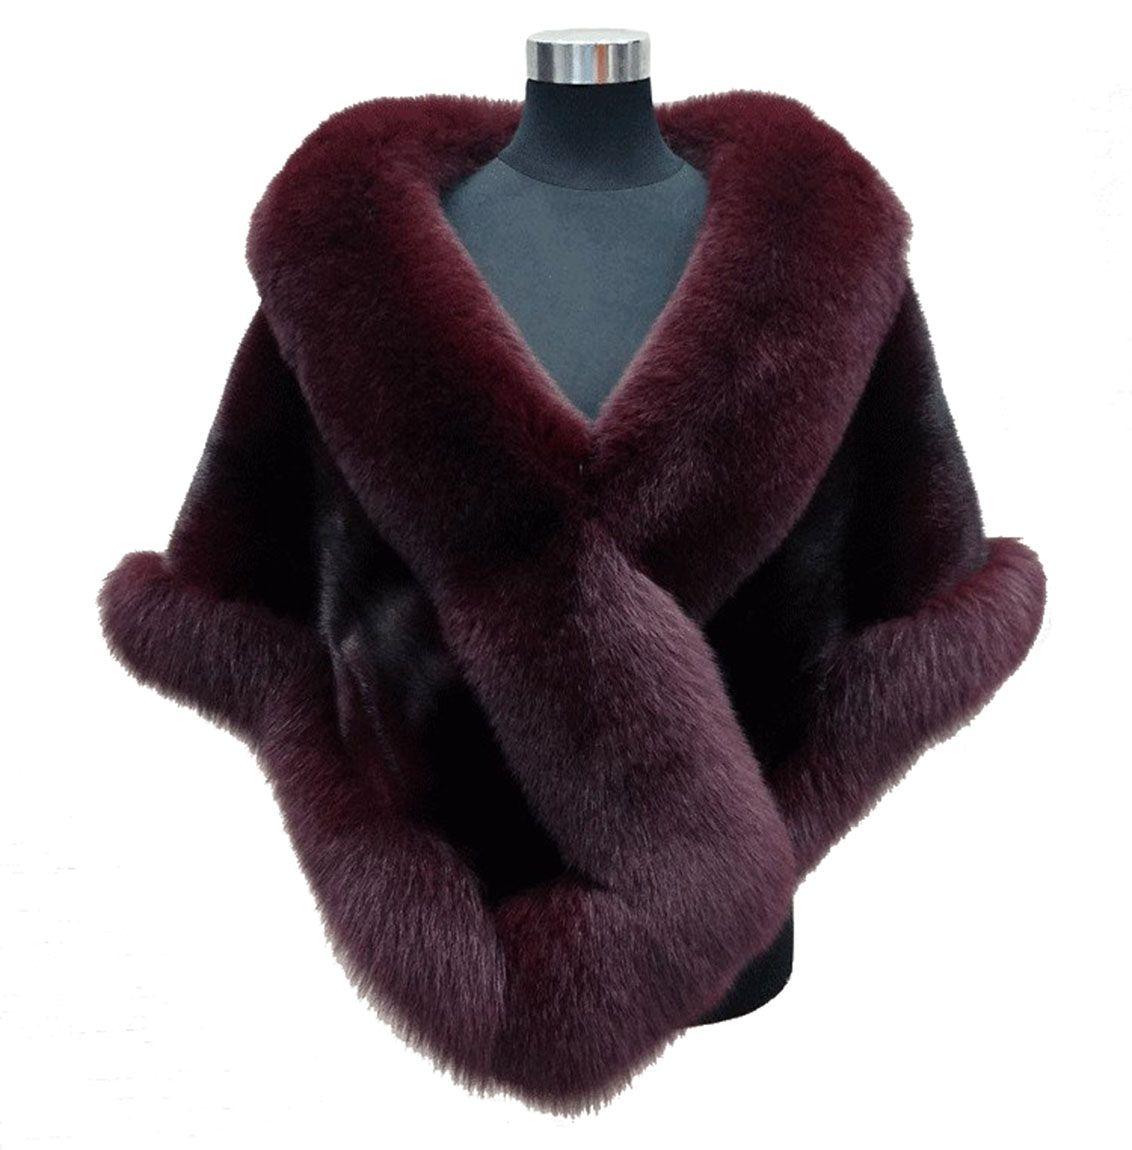 Autumn winter 2019 newest long fox faux fur bridal Wraps evening dress shawl cloak scarf female Party Cocktail